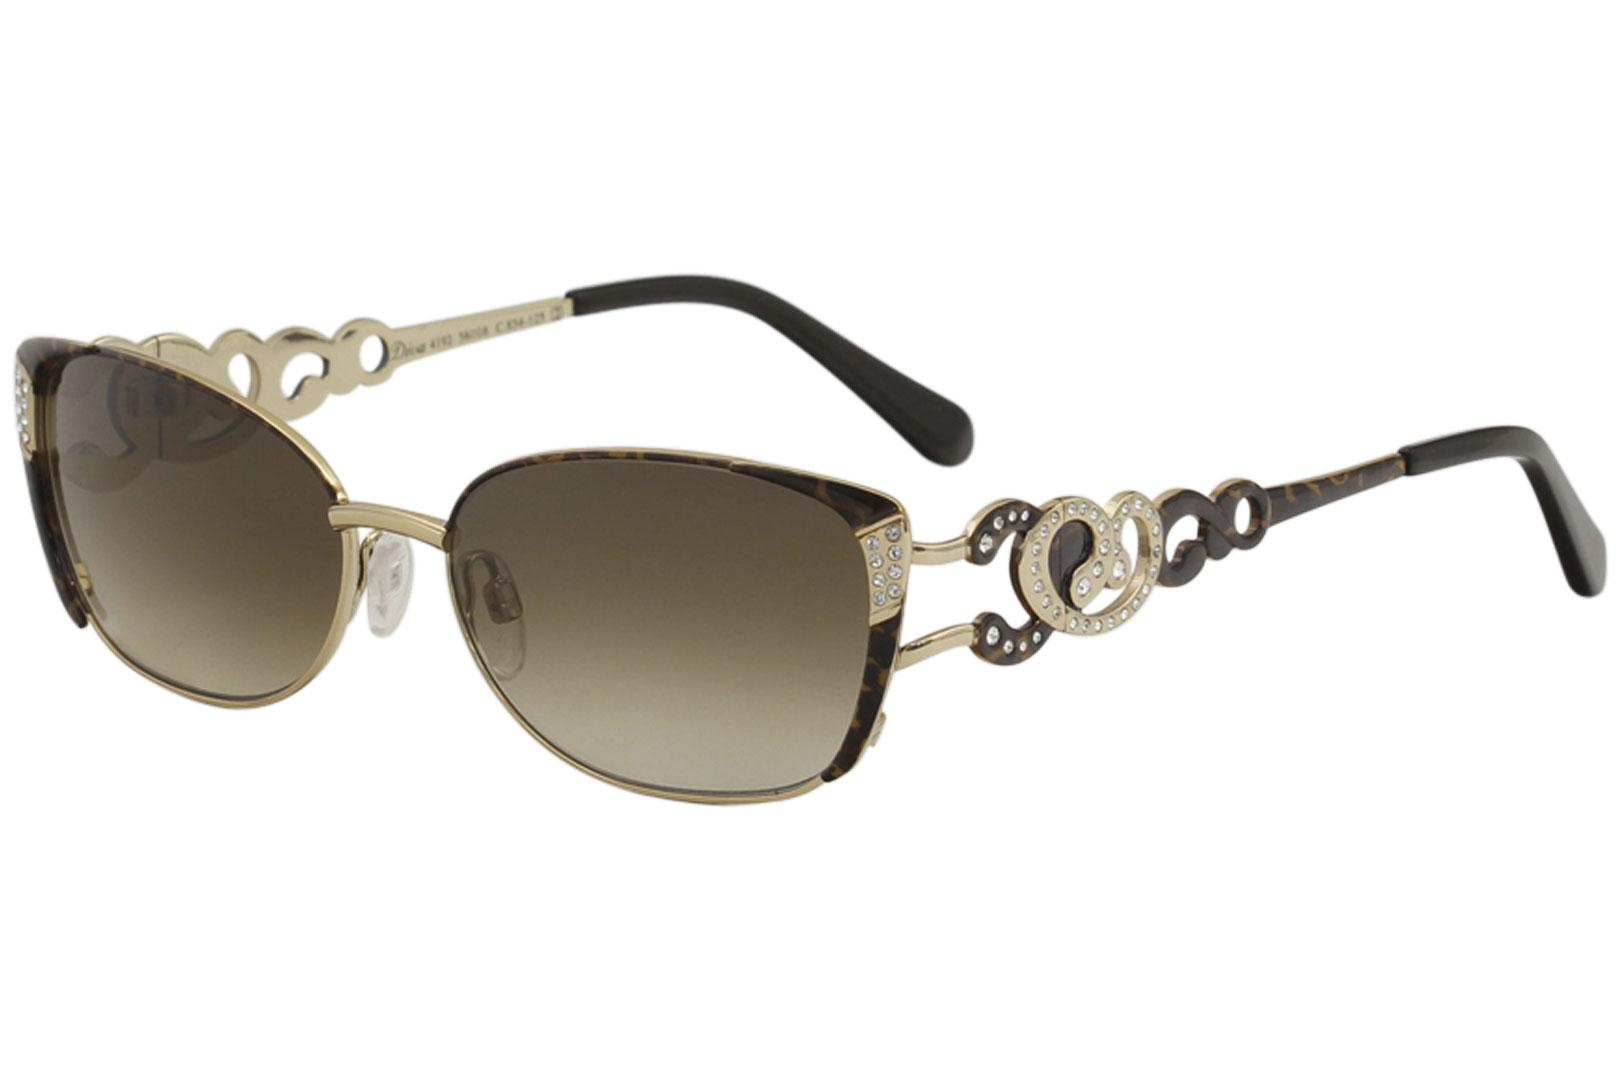 Image of Diva Women's 4192 Fashion Rectangle Sunglasses - Cheetah Gold/Brown Gradient   854 - Lens 56 Bridge 16 Temple 125mm